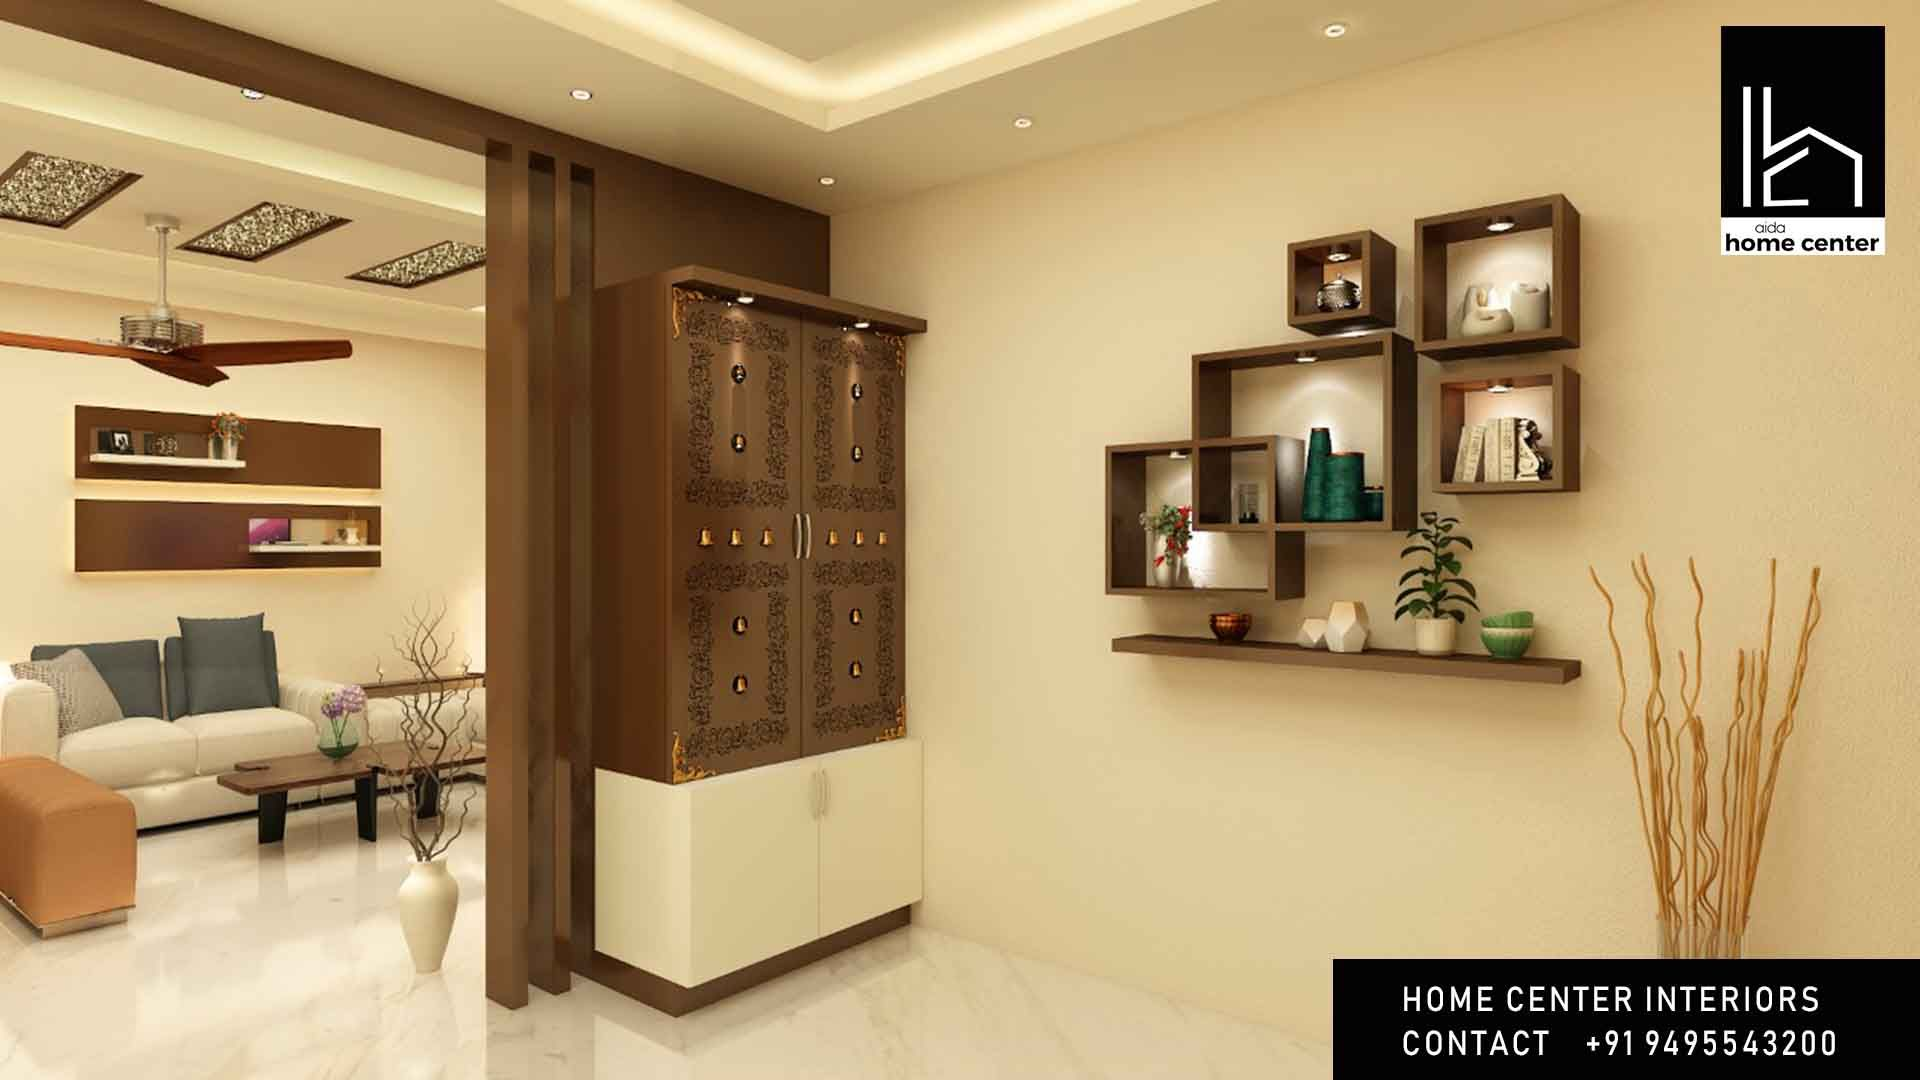 Best Interior Designers In Kottayam Kerala Home Interior Designs Home Interior Design House Interior Best Interior